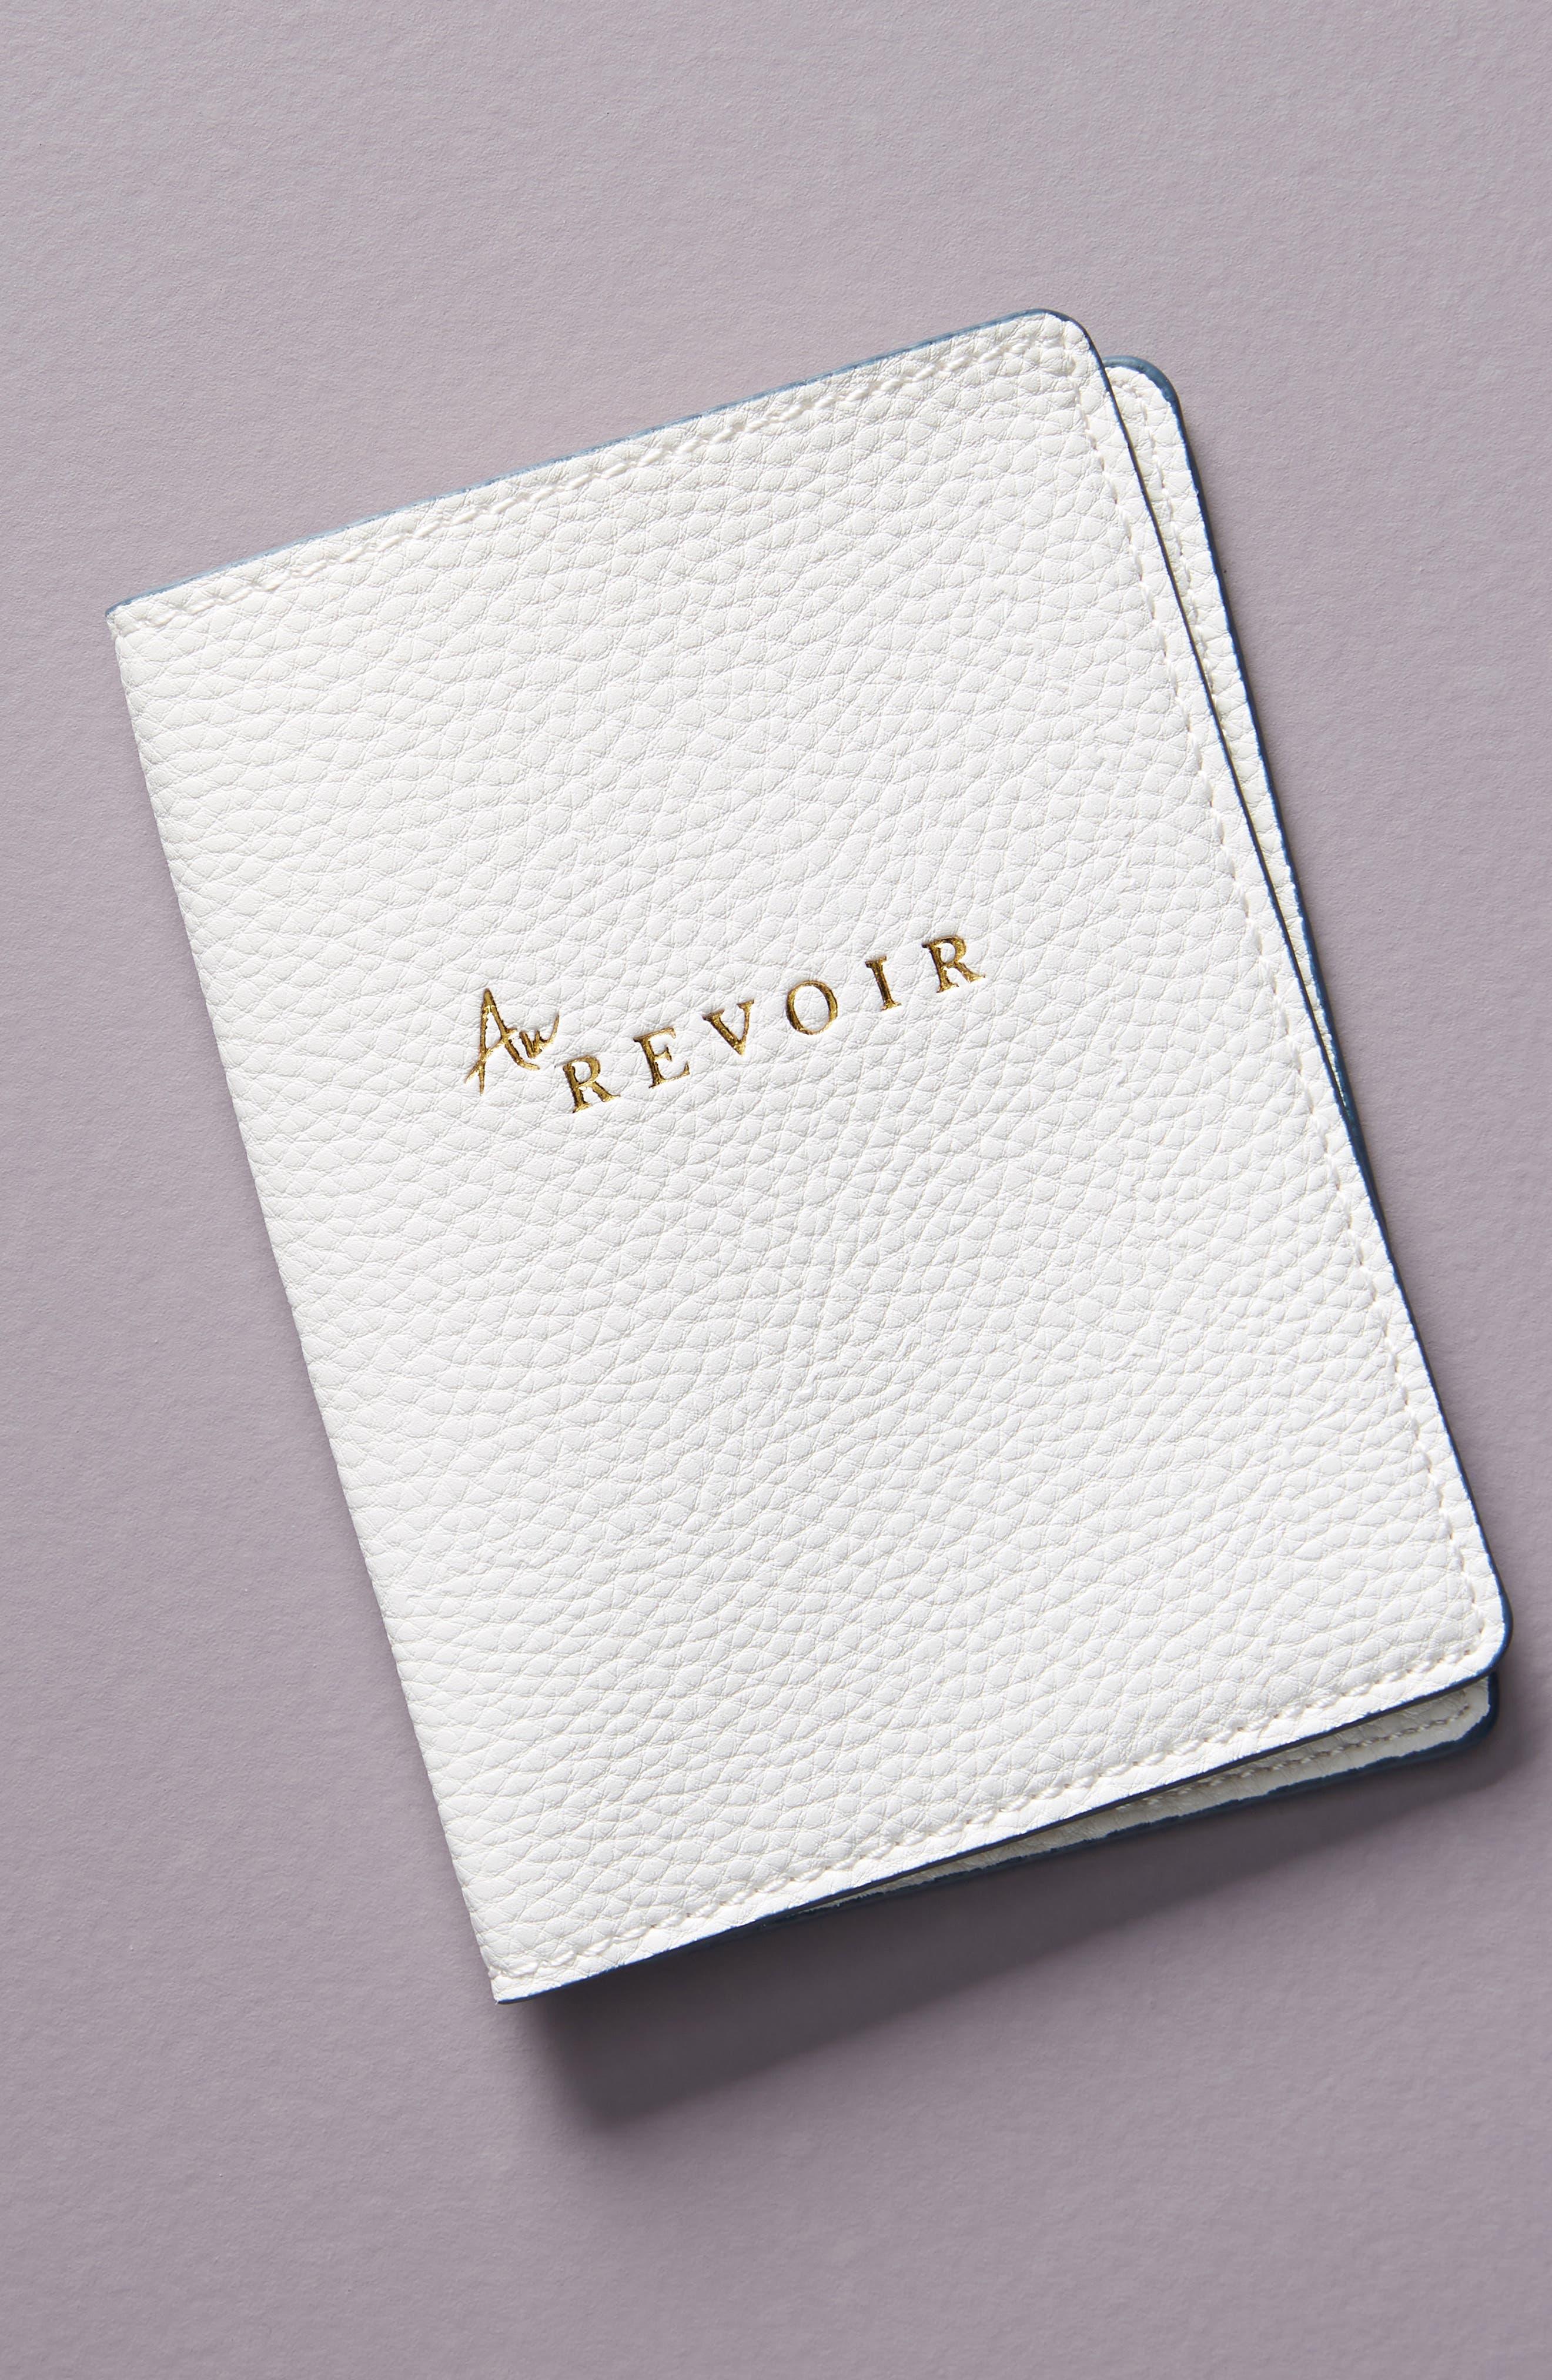 ANTHROPOLOGIE, Au Revoir Passport Holder, Main thumbnail 1, color, WHITE